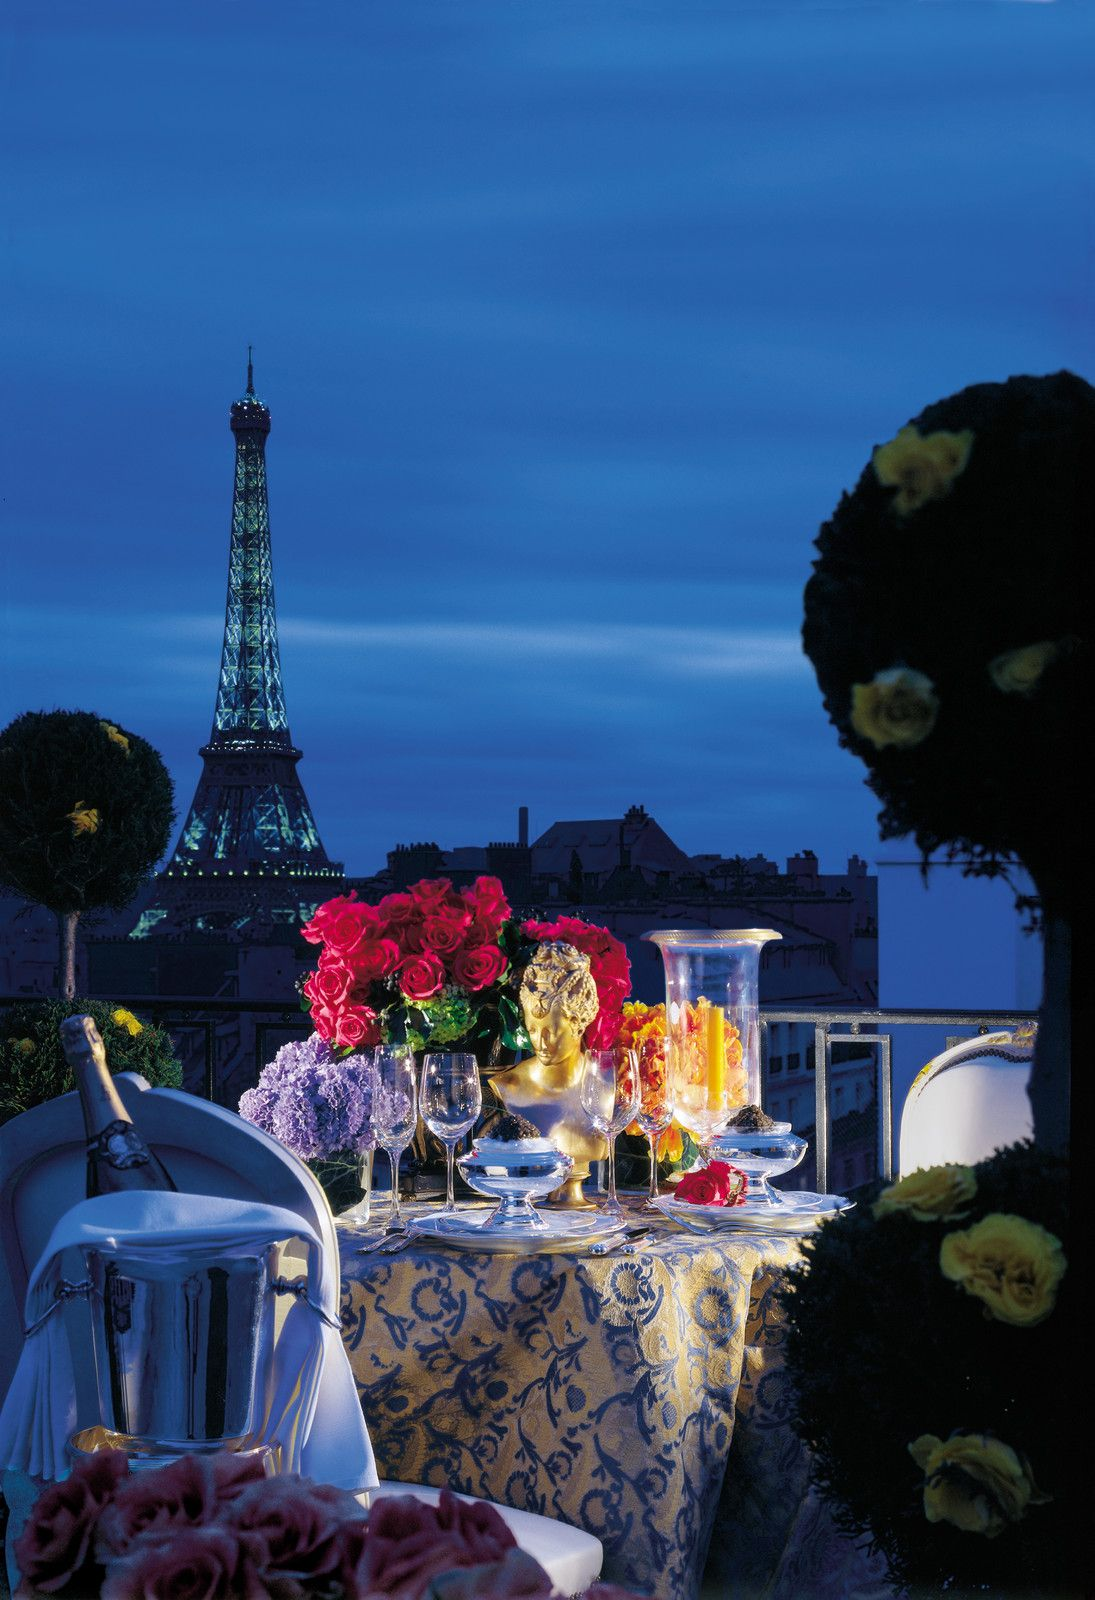 Dinner Places Near Eiffel Tower